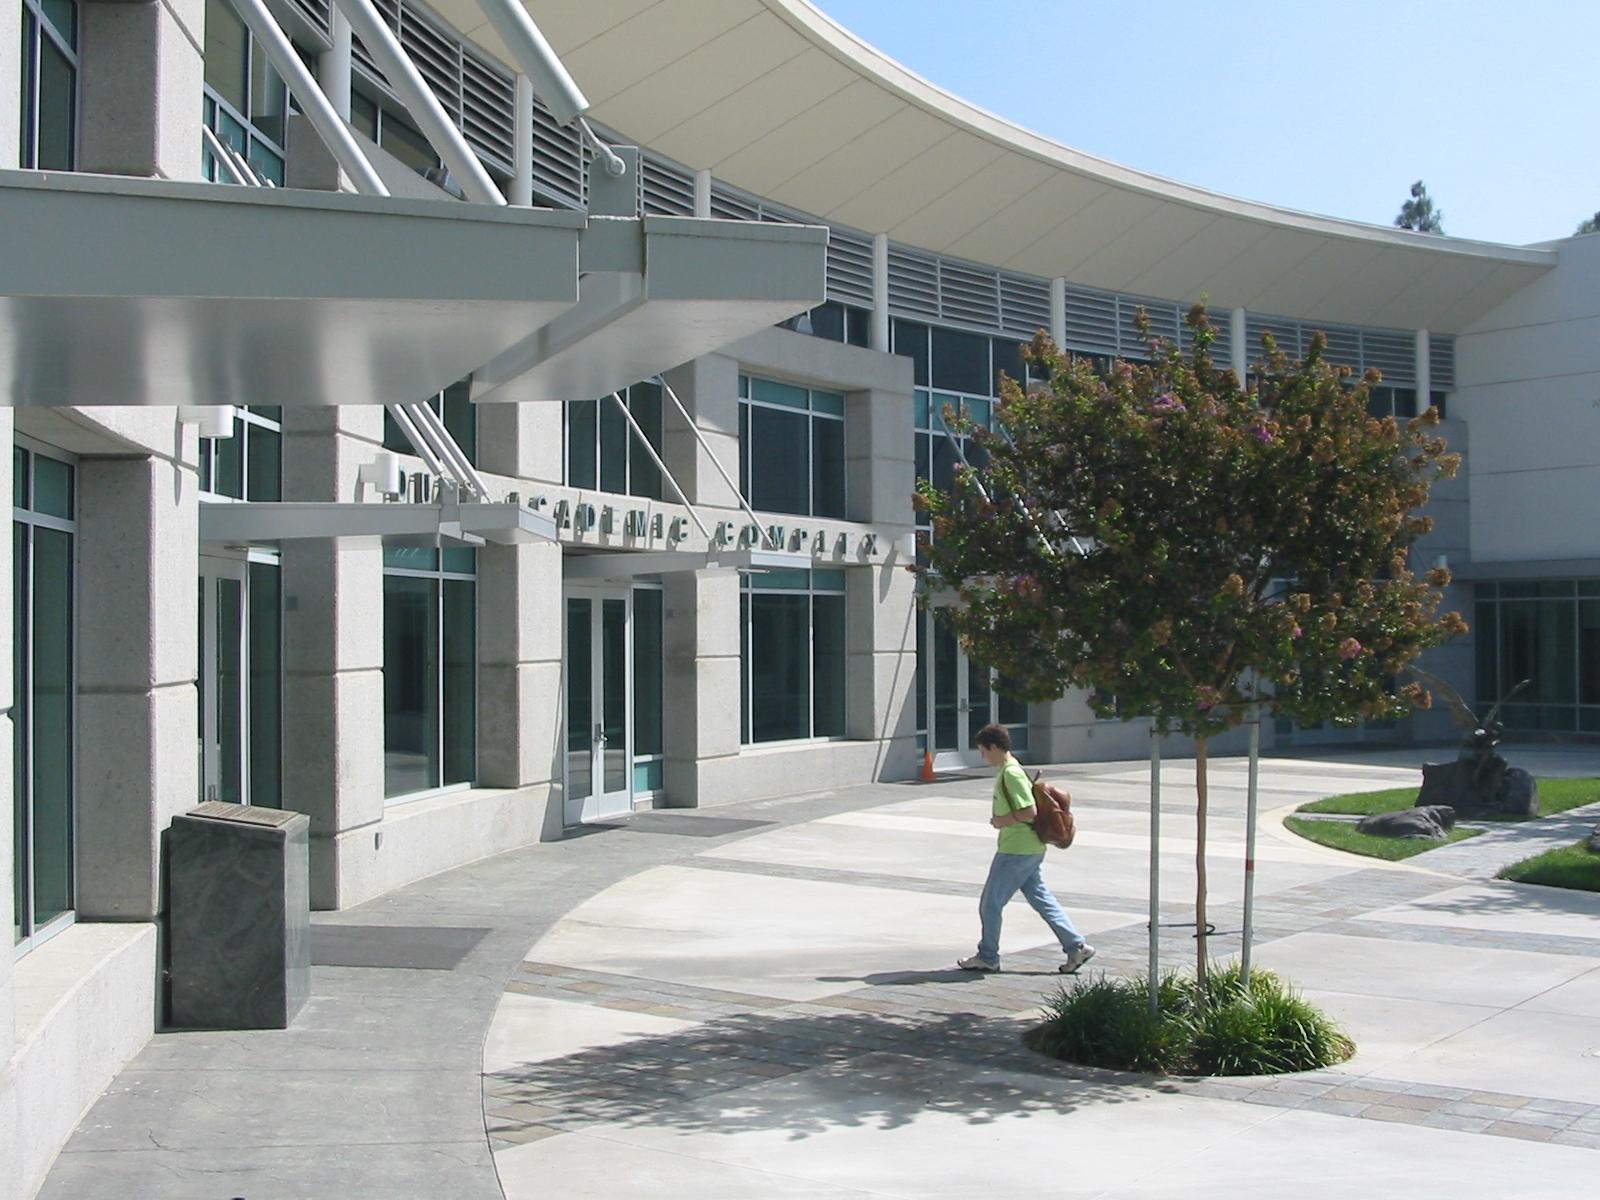 azusa pacific university duke academic complex - Azusa, California